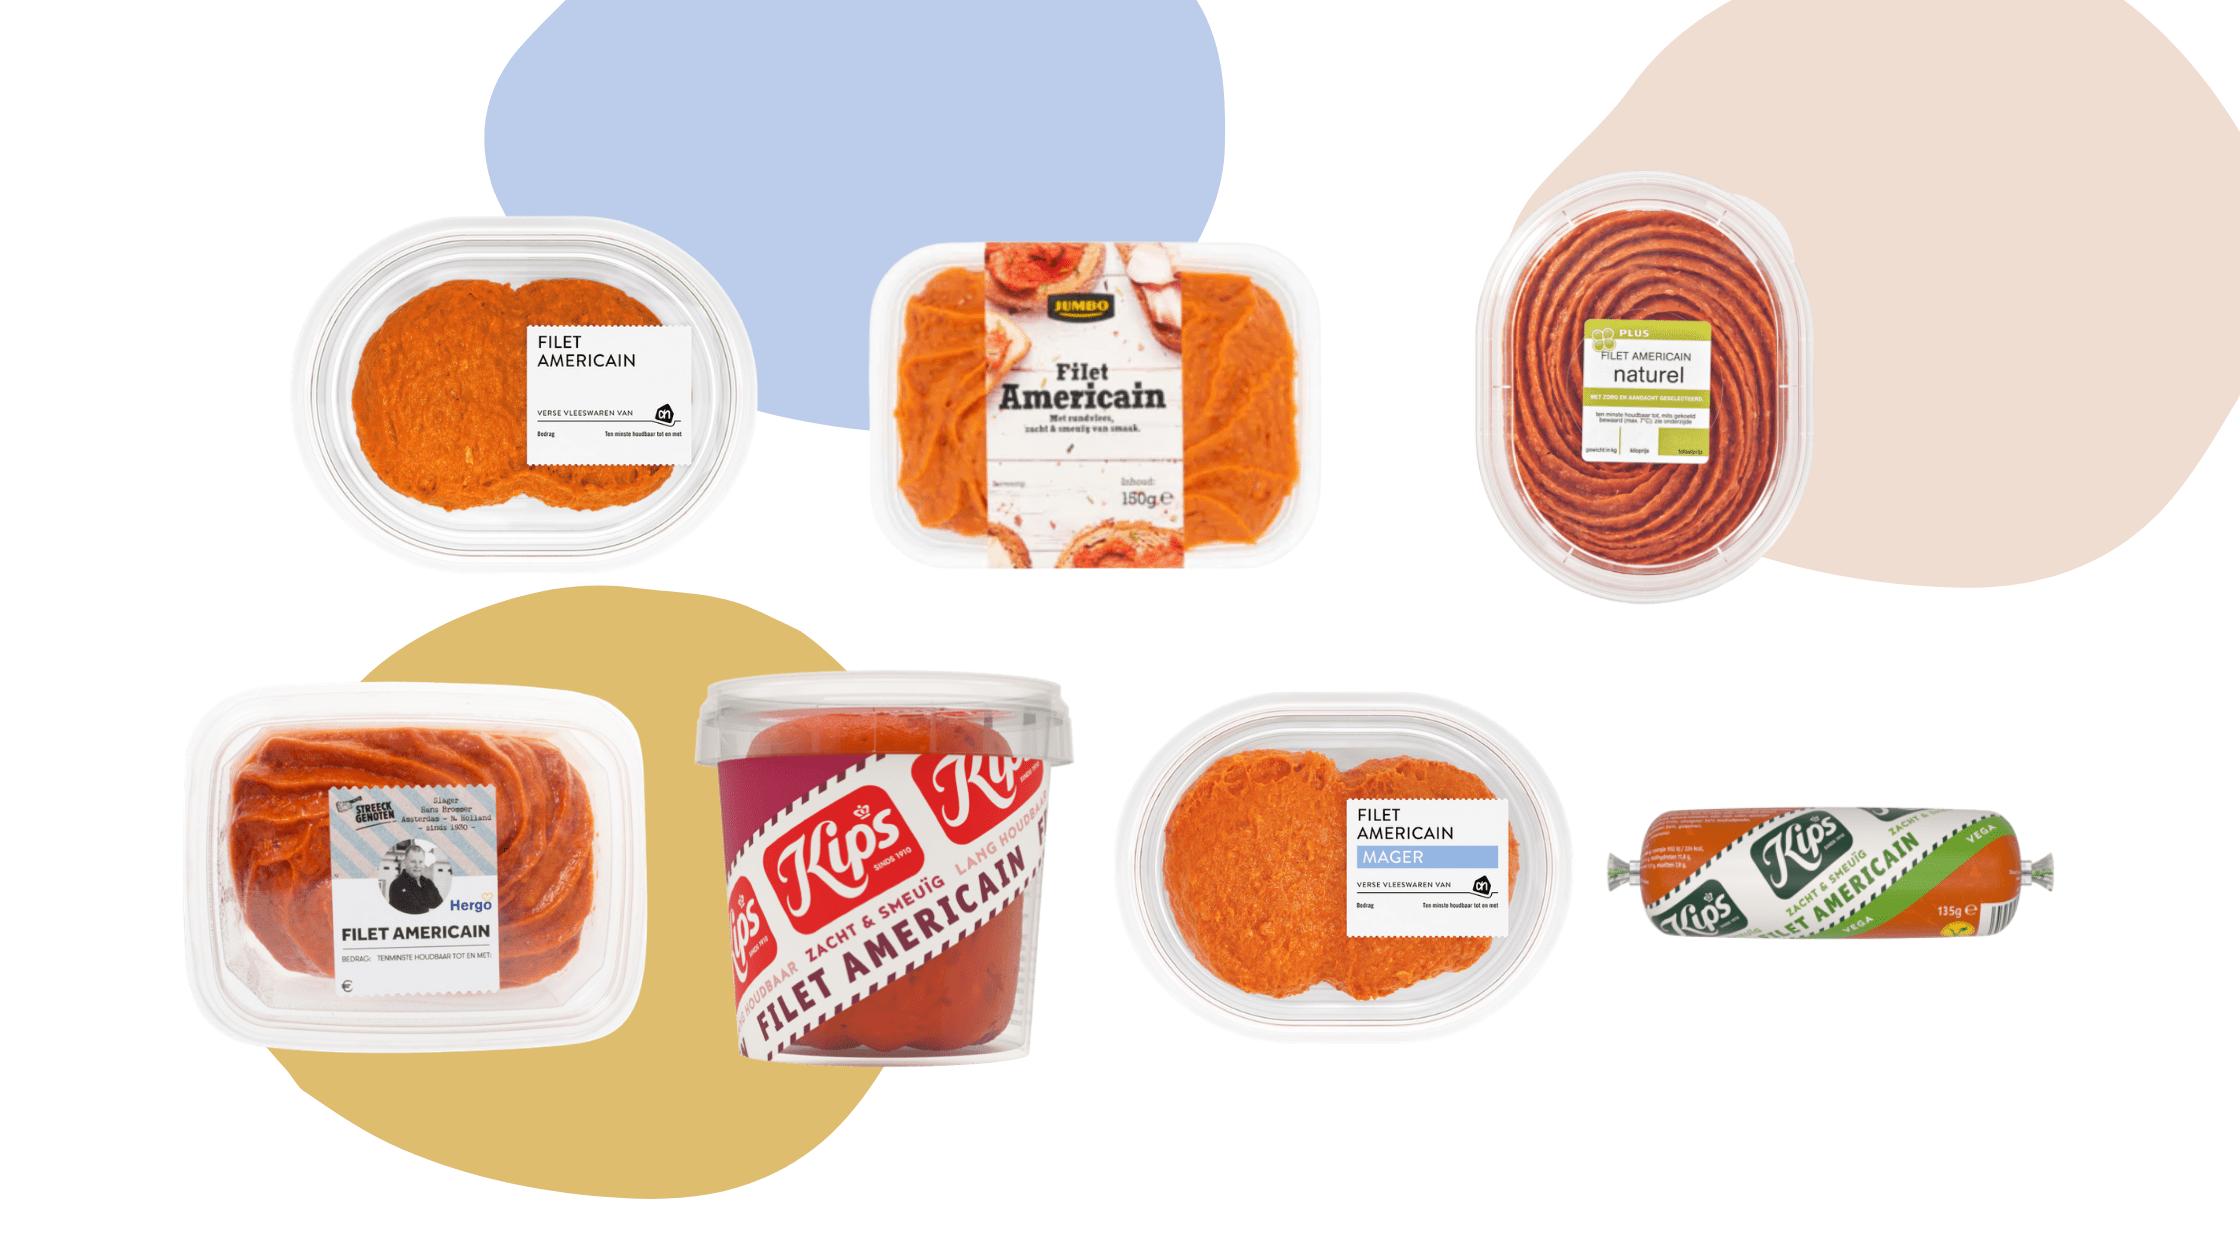 Welke filet americain is gezond